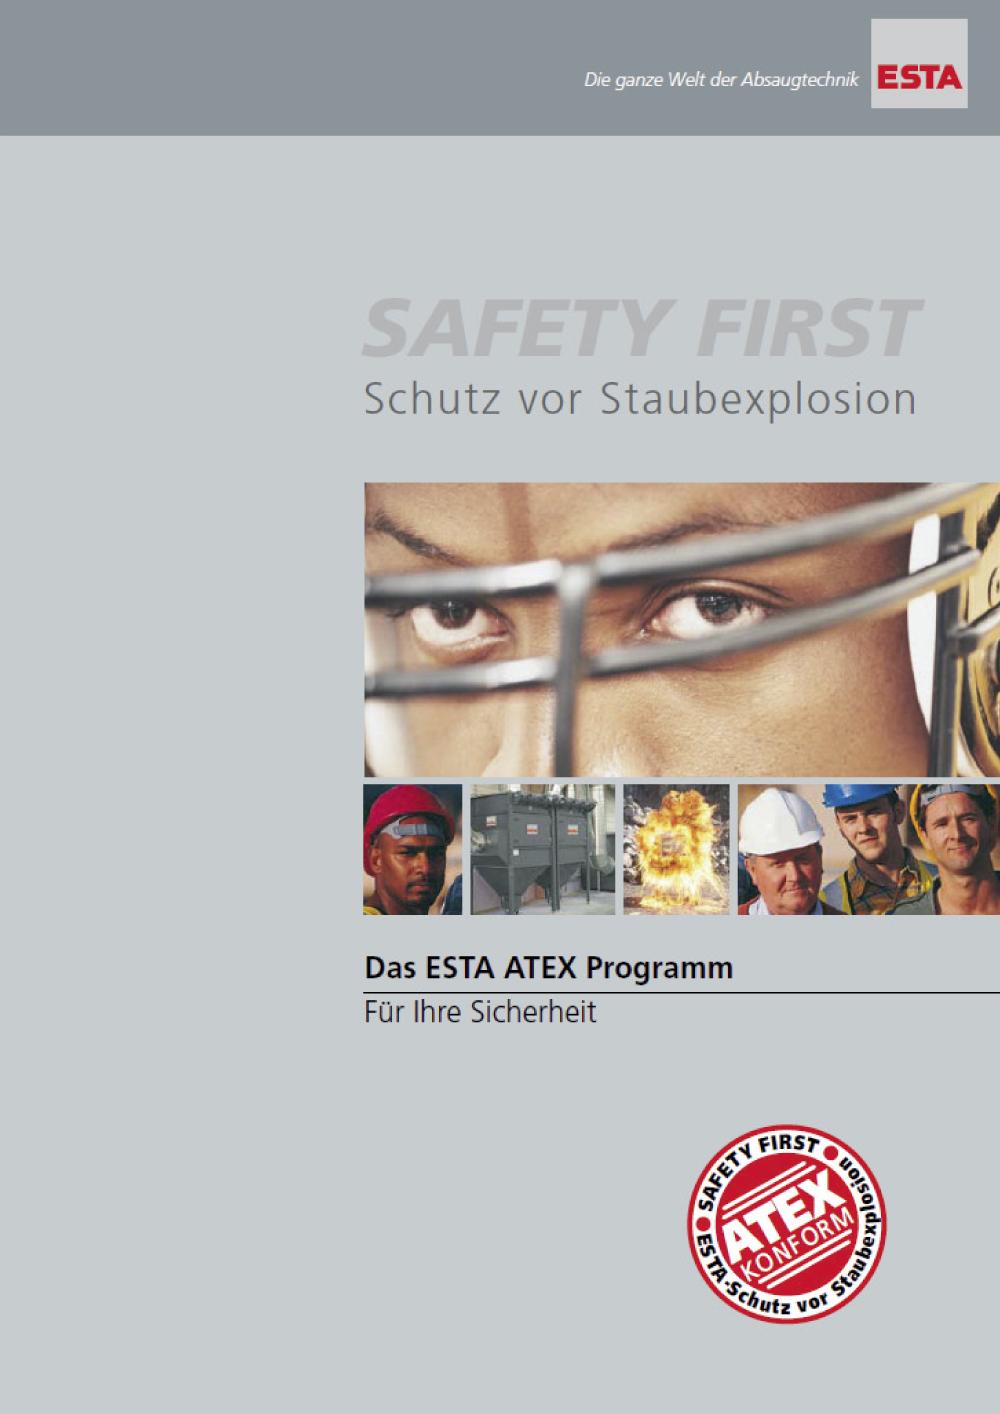 Das ESTA ATEX-Prospekt.